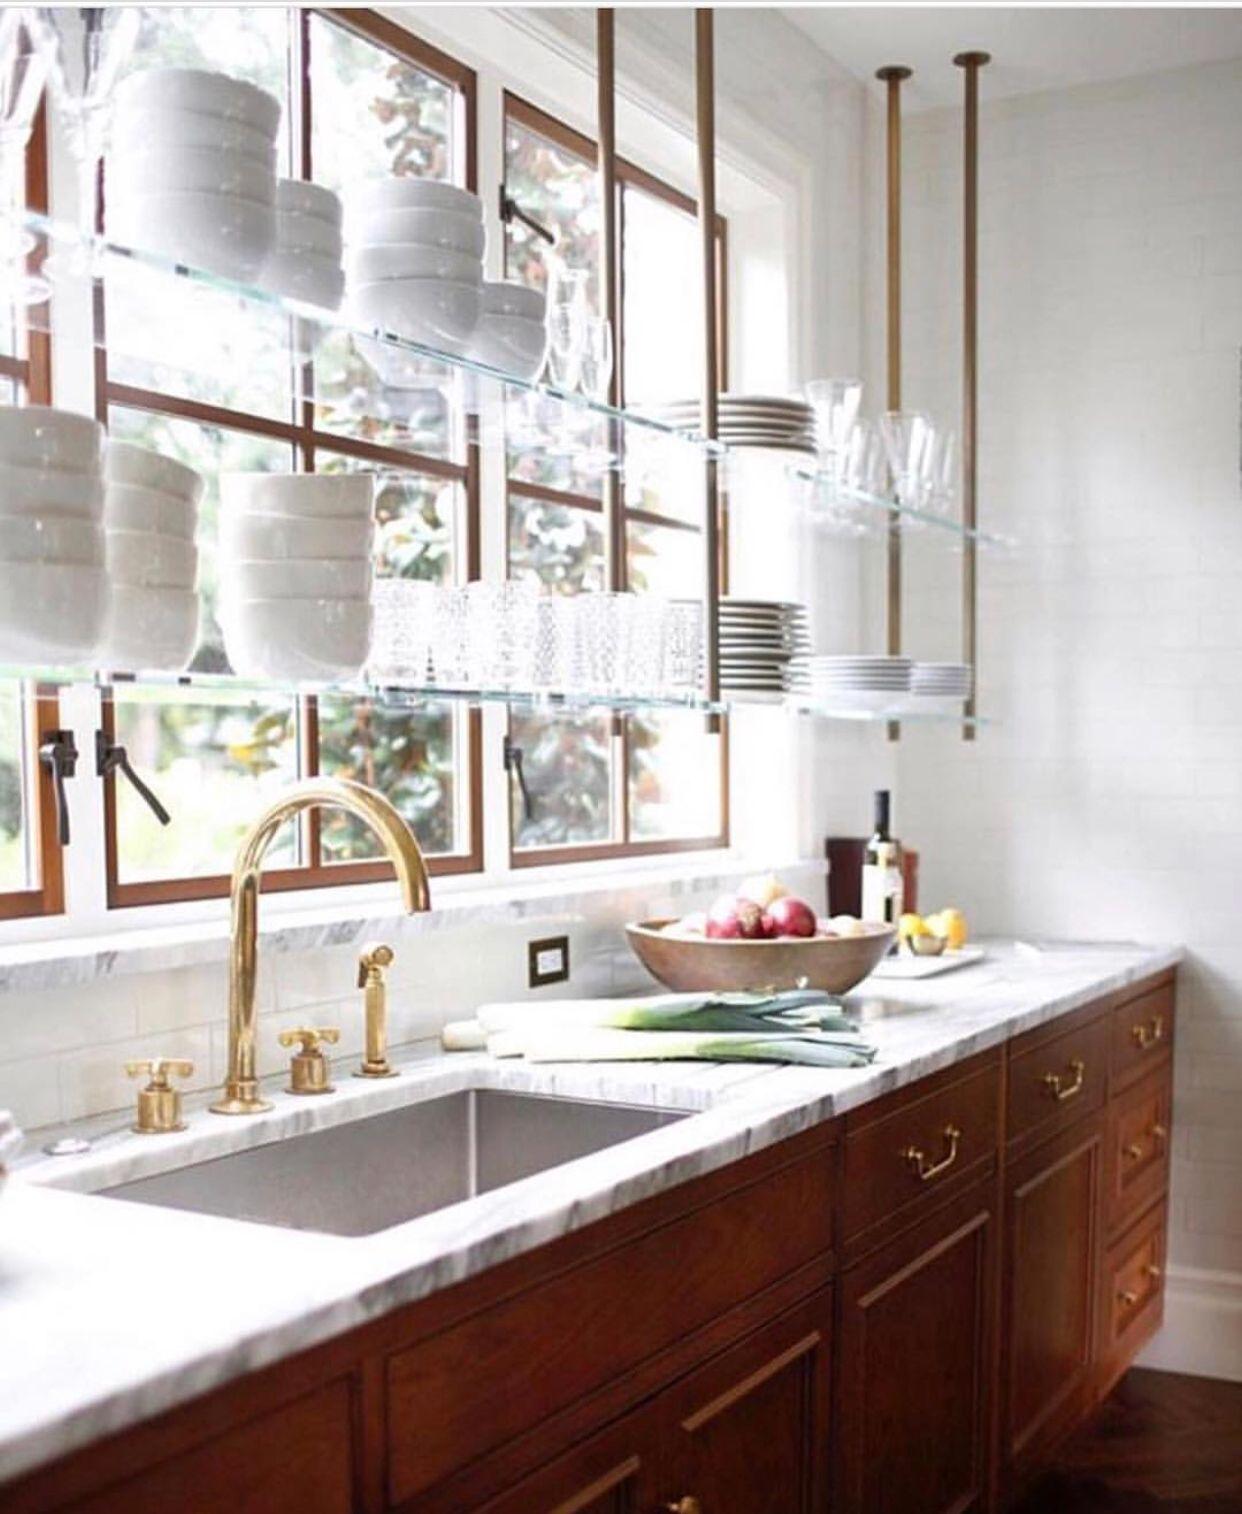 Waterworks Kitchen Glass Shelves In Front Of Window Instead Of